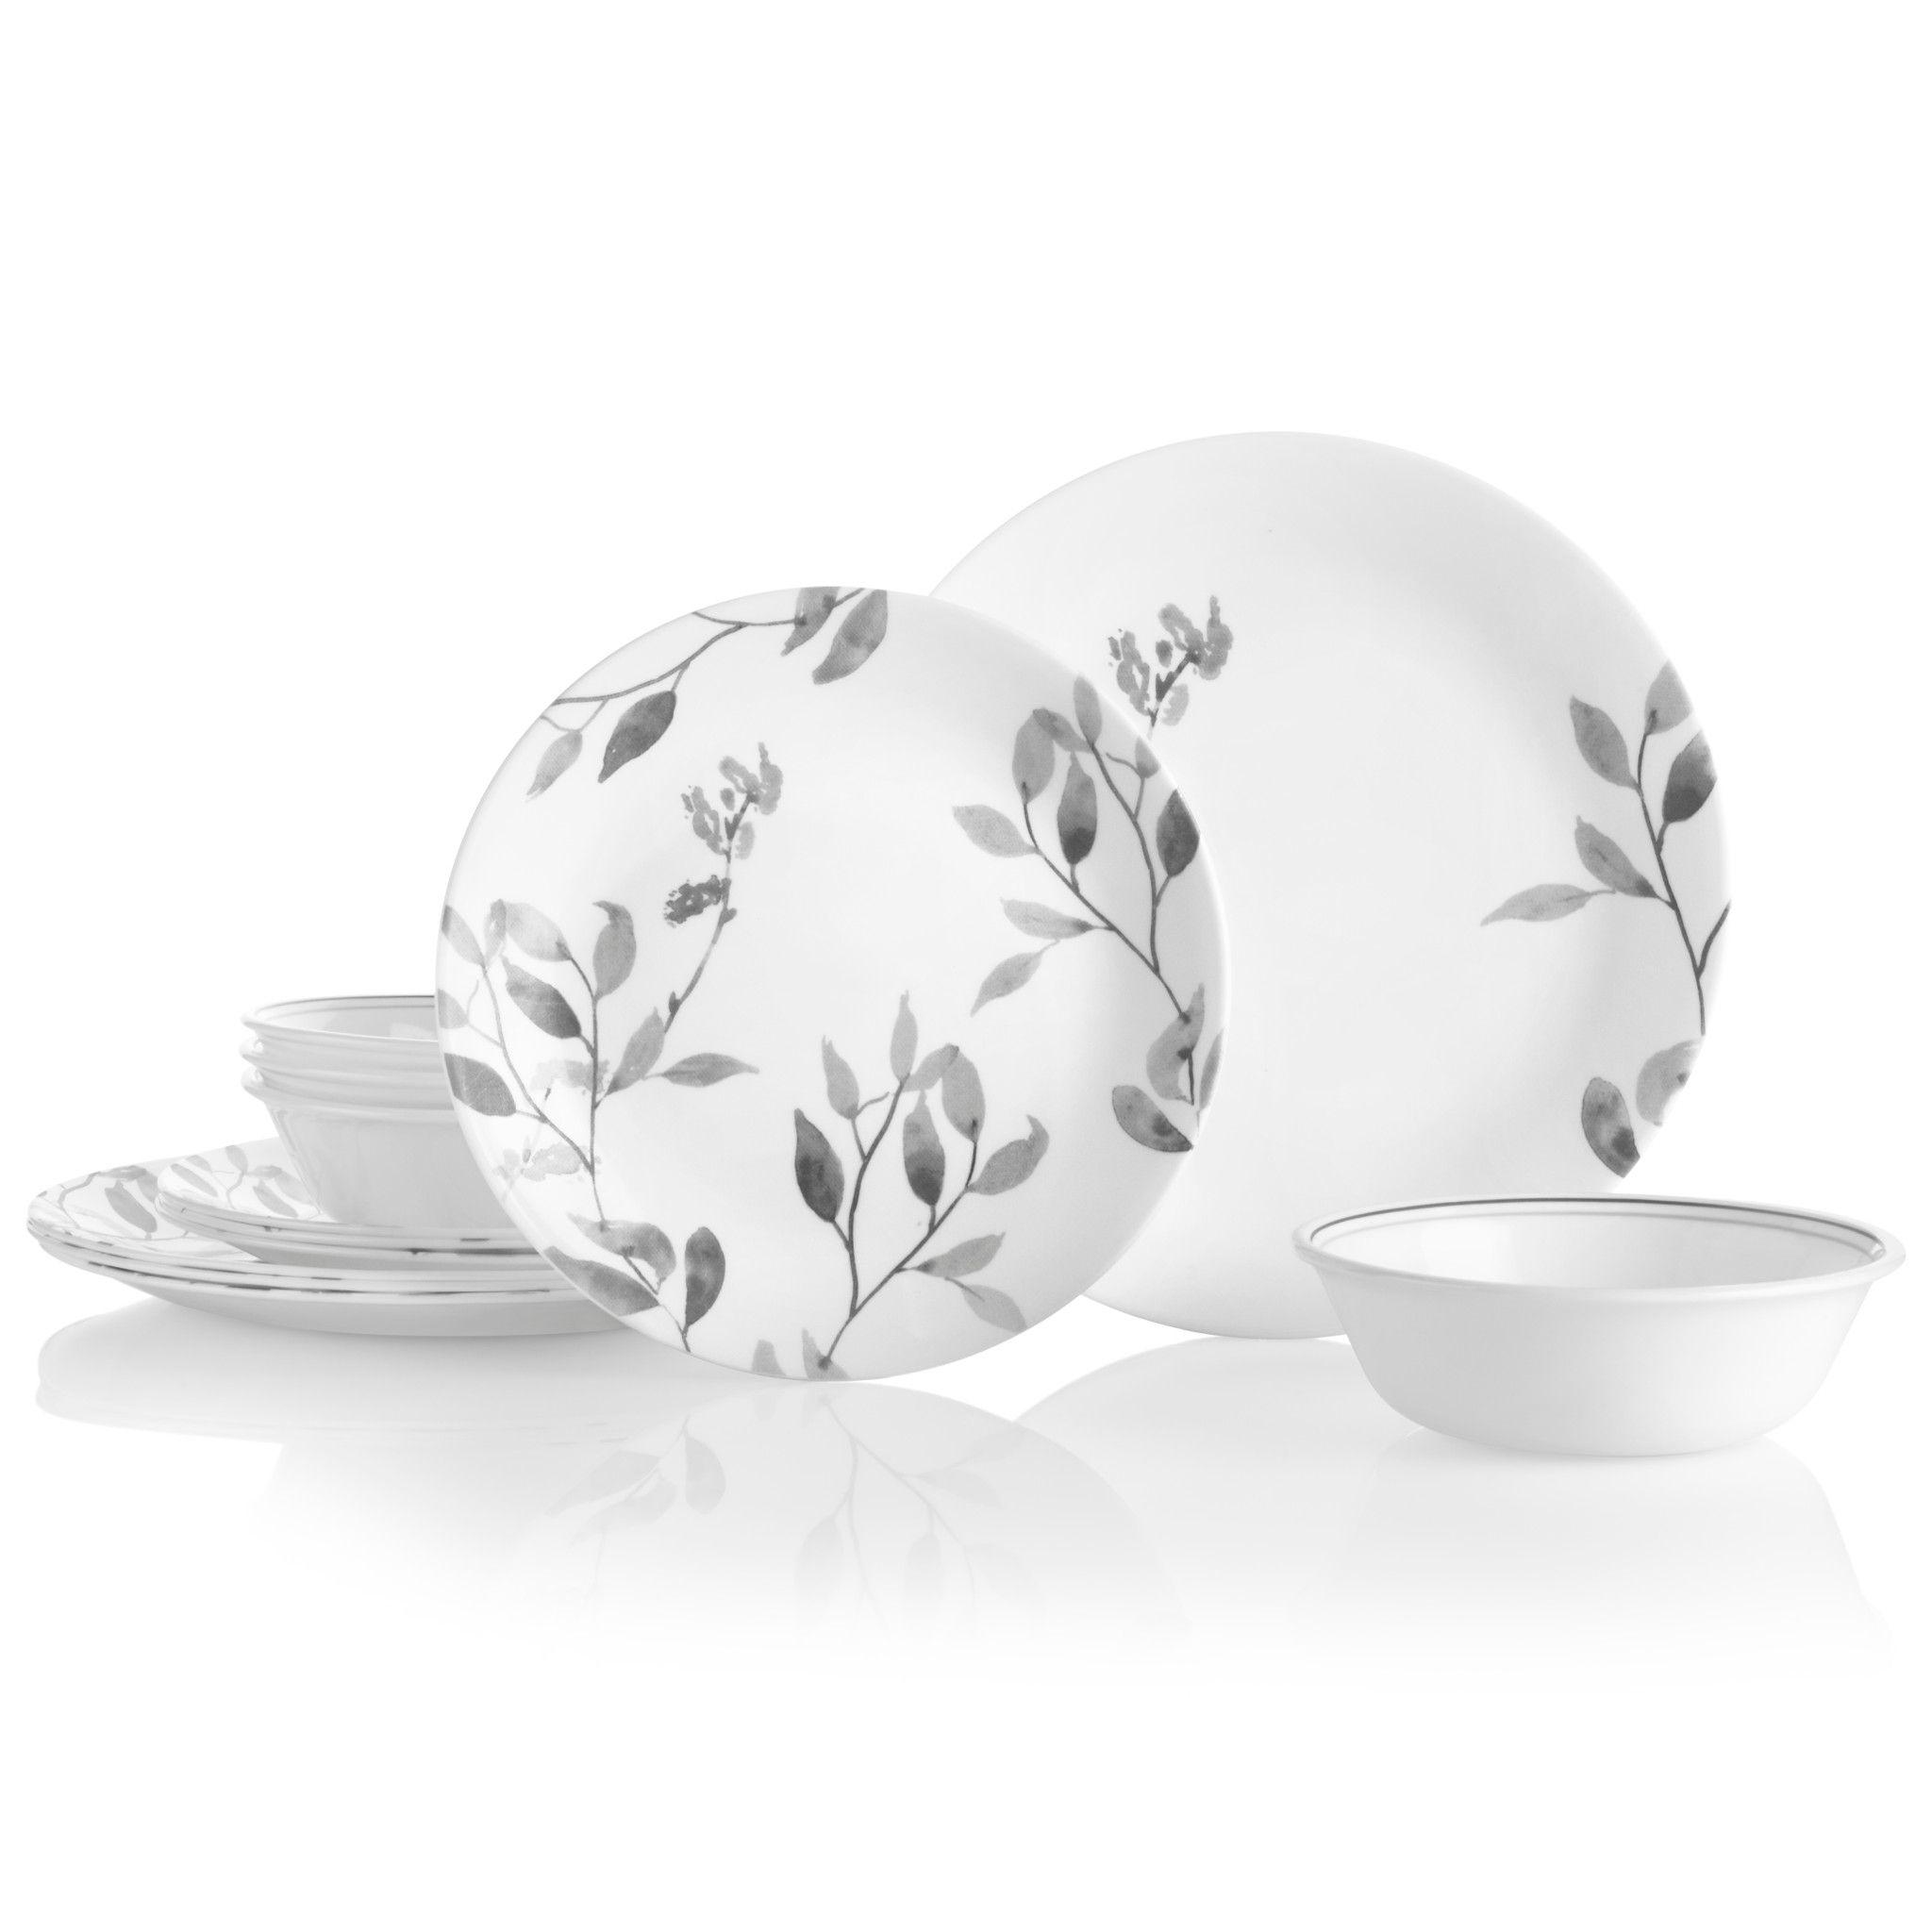 Misty Leaves 12-piece Dinnerware Set, Service for 4